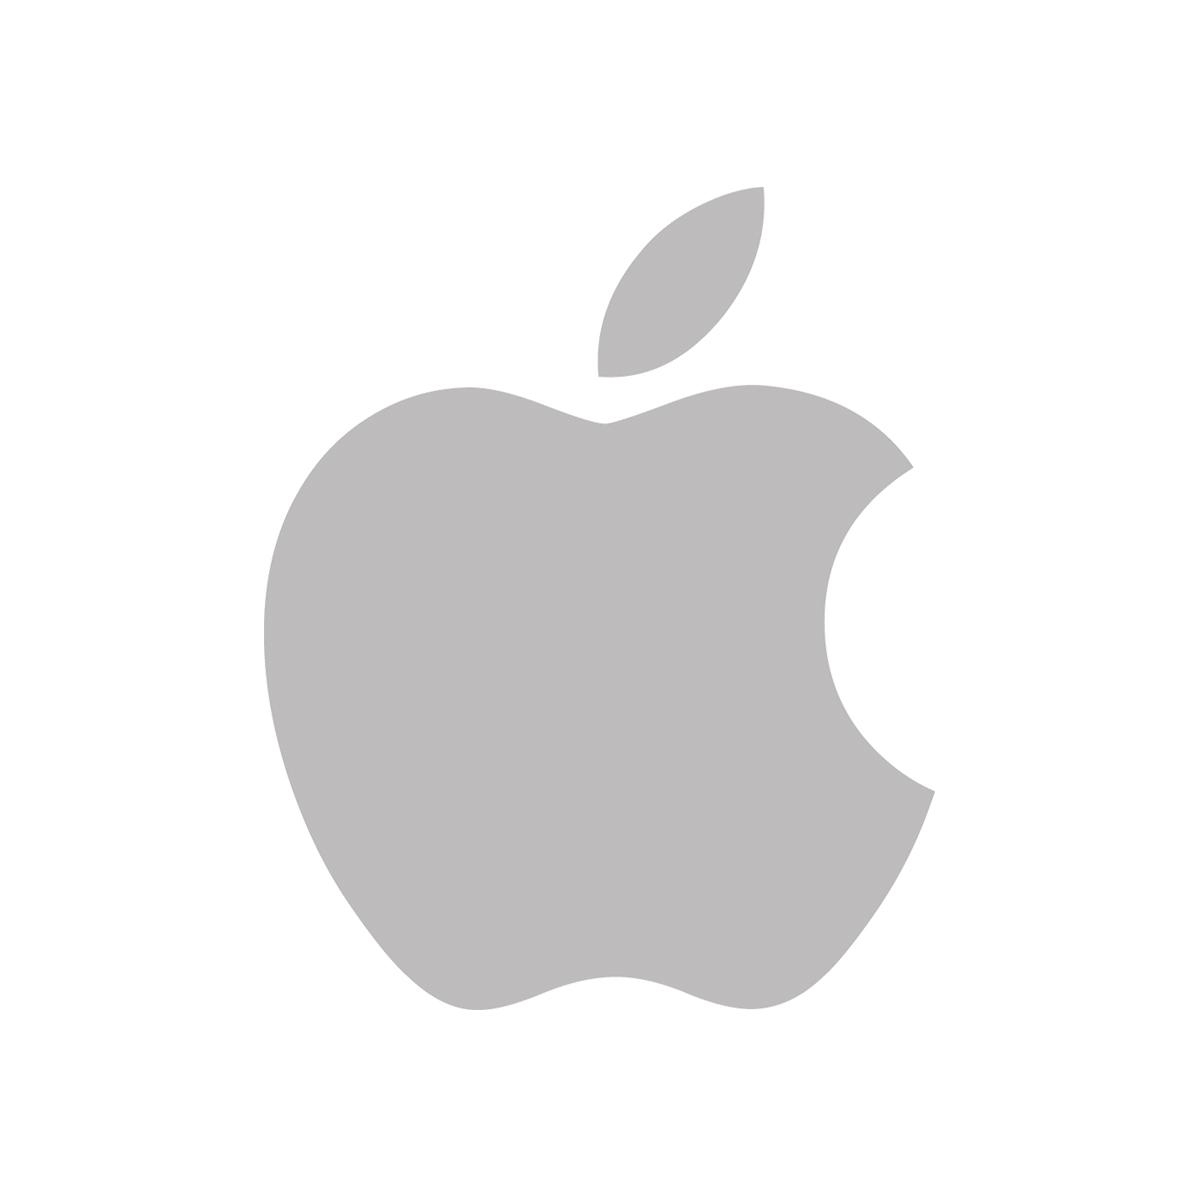 _apple [cc] partner by Graham Hnedak Brand G Creative 18 JAN 2015.jpg